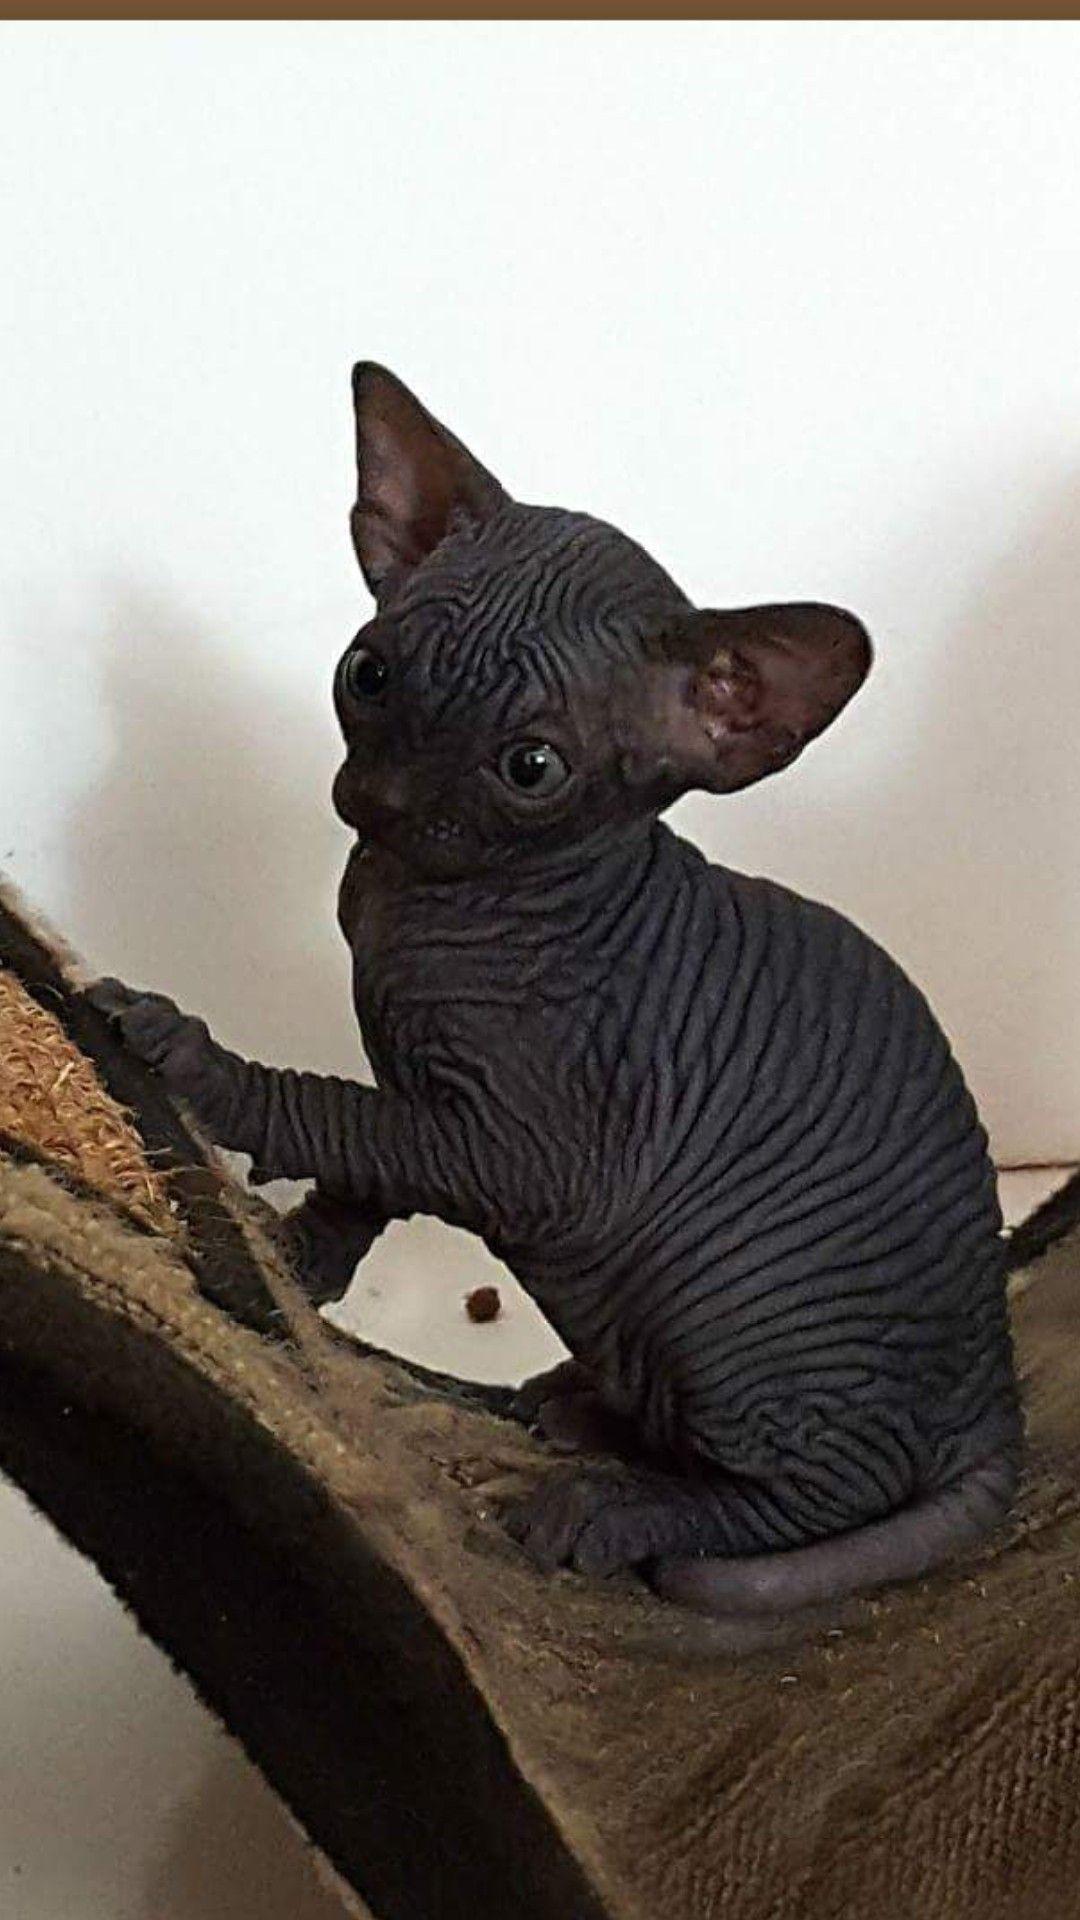 My baby boy Zazel Pretty cats, Cute animals, Hairless cat